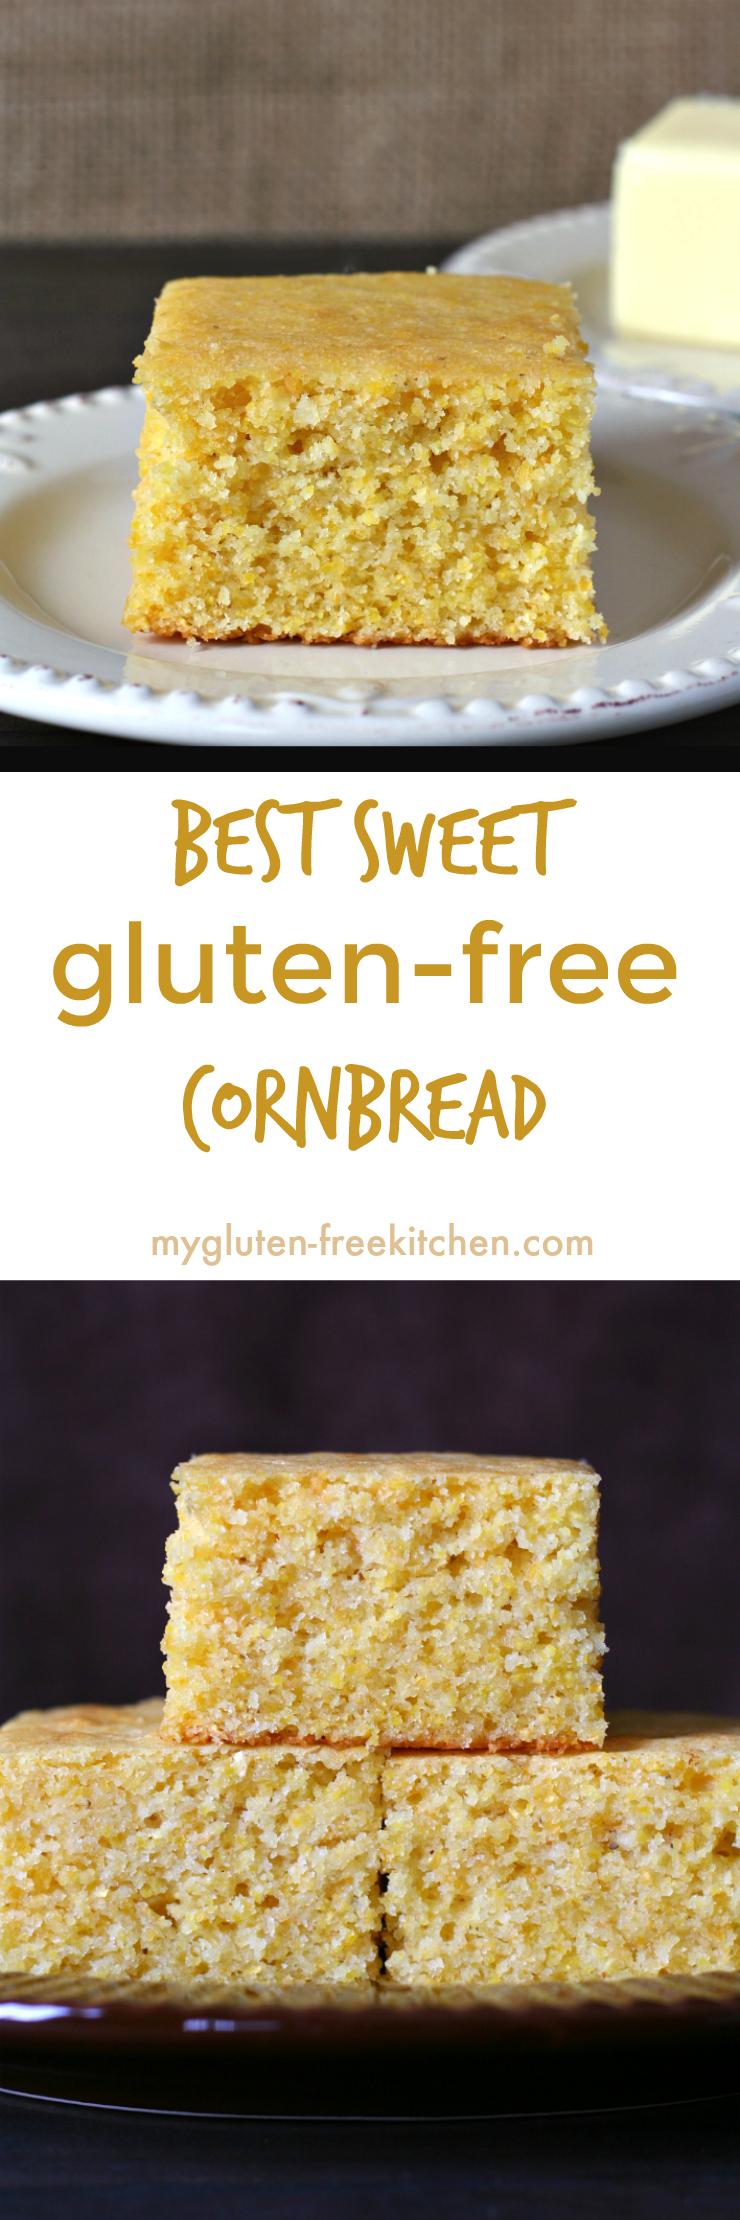 The best gluten-free sweet cornbread! Tried and true recipe!